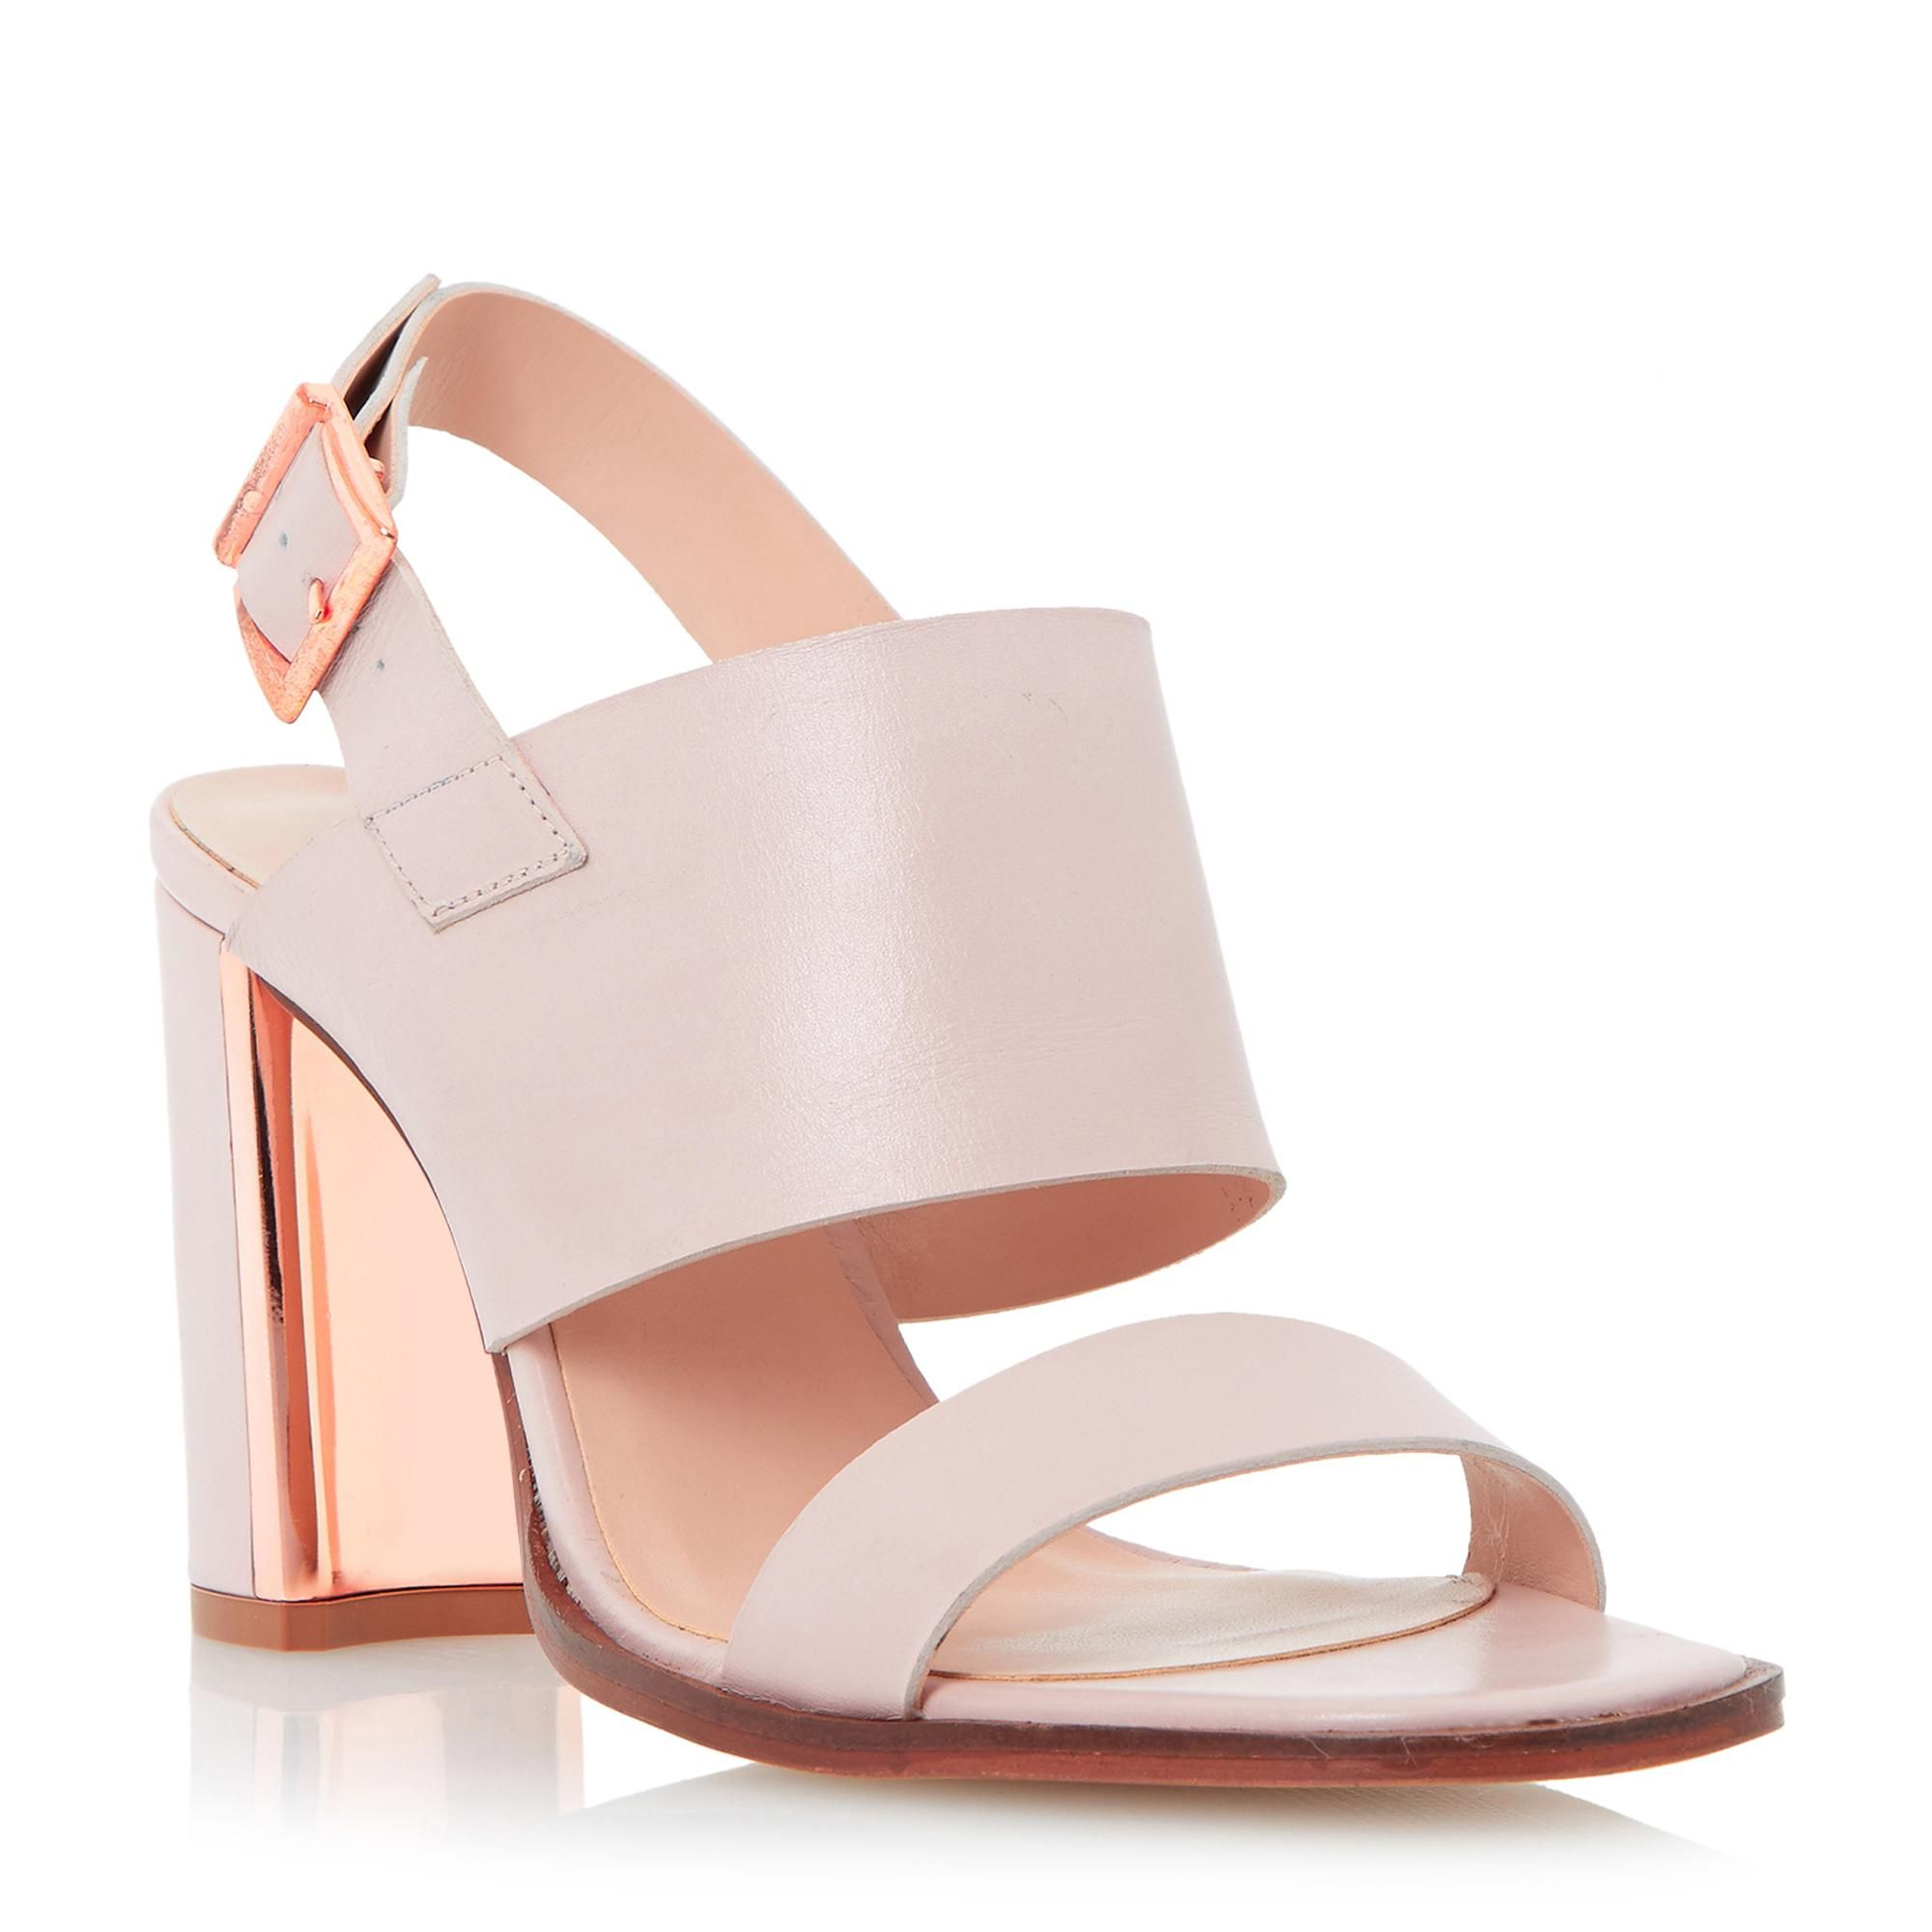 9e7429a1fe1c Dune Ladies MAIZIE Metal Trim Block Heel Leather Sandal in Blush ...